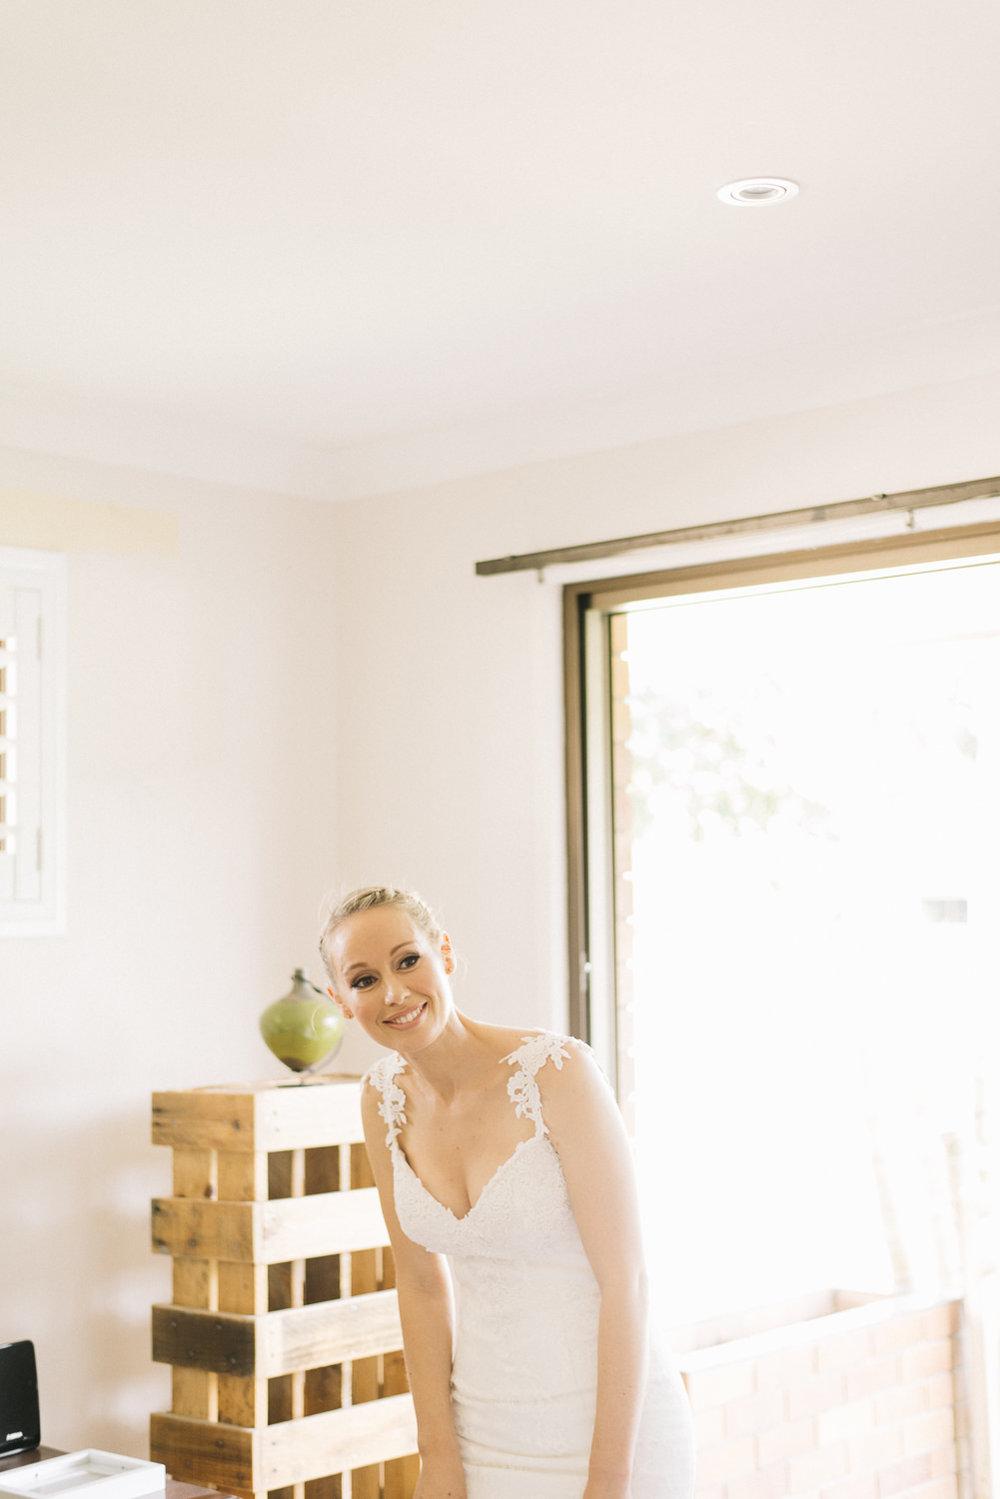 Ryan-sarah-jfk-wood-fire-gold-coast-wedding-35.jpg